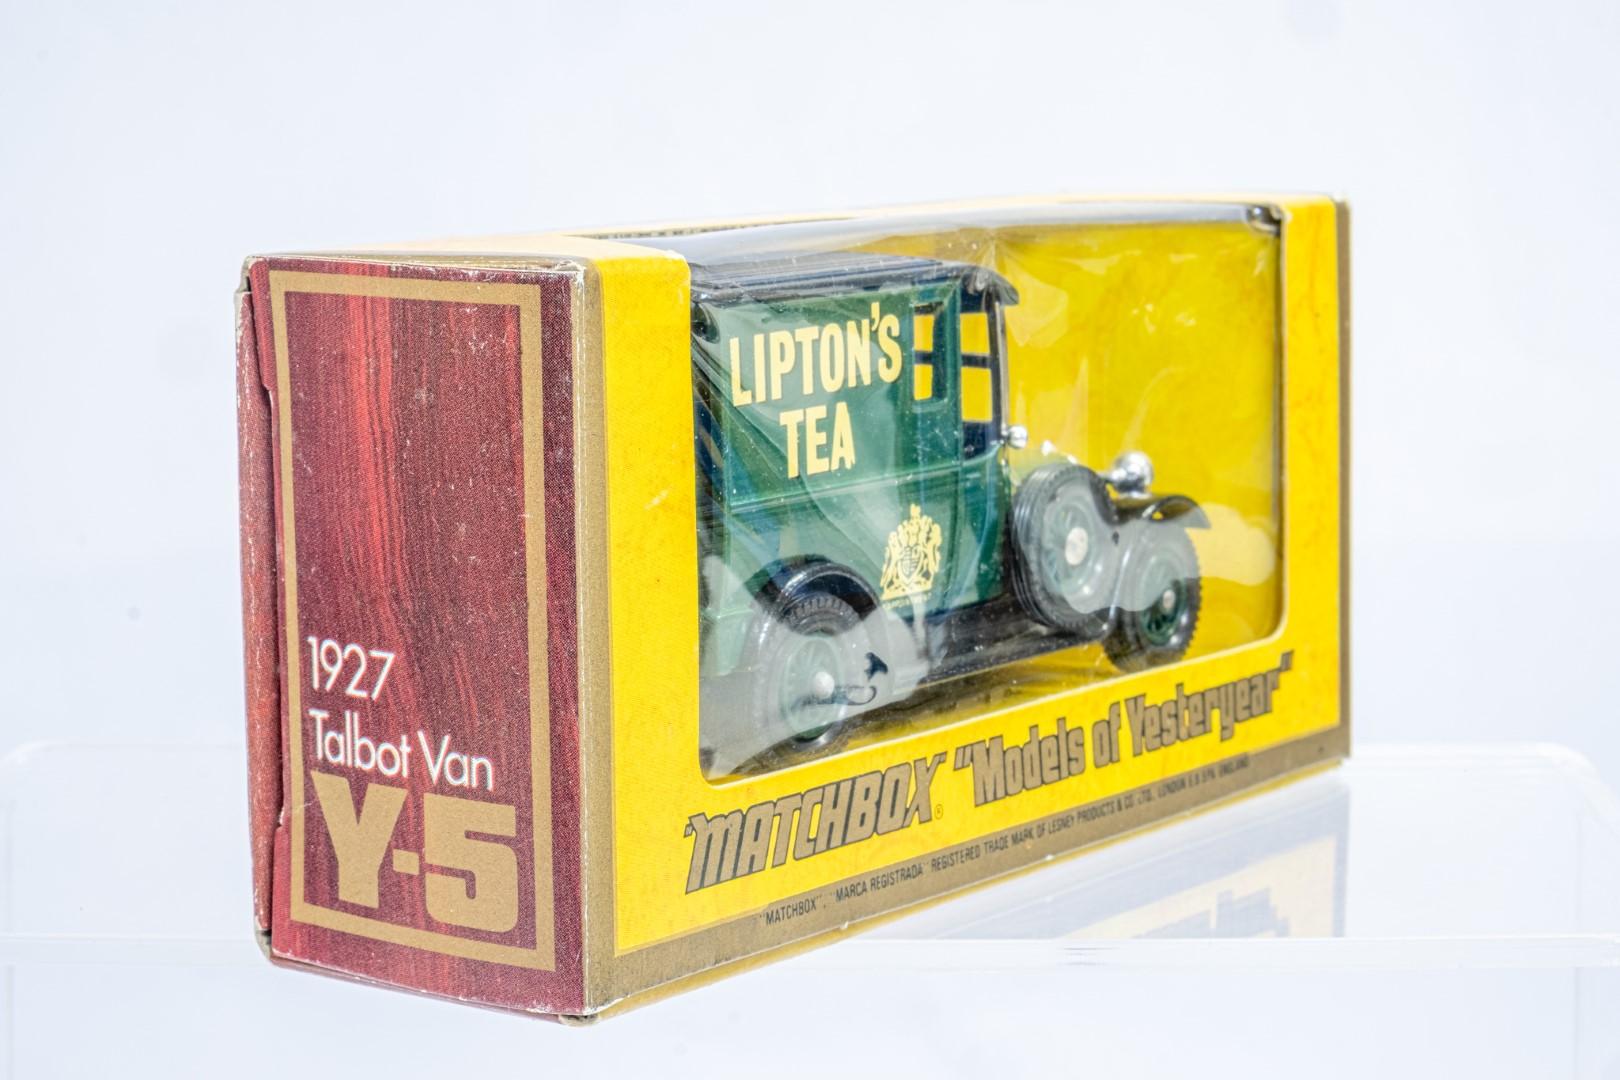 Matchbox 1927 Talbot Van Y-5 - Liptions Tea - Rare - Image 3 of 9